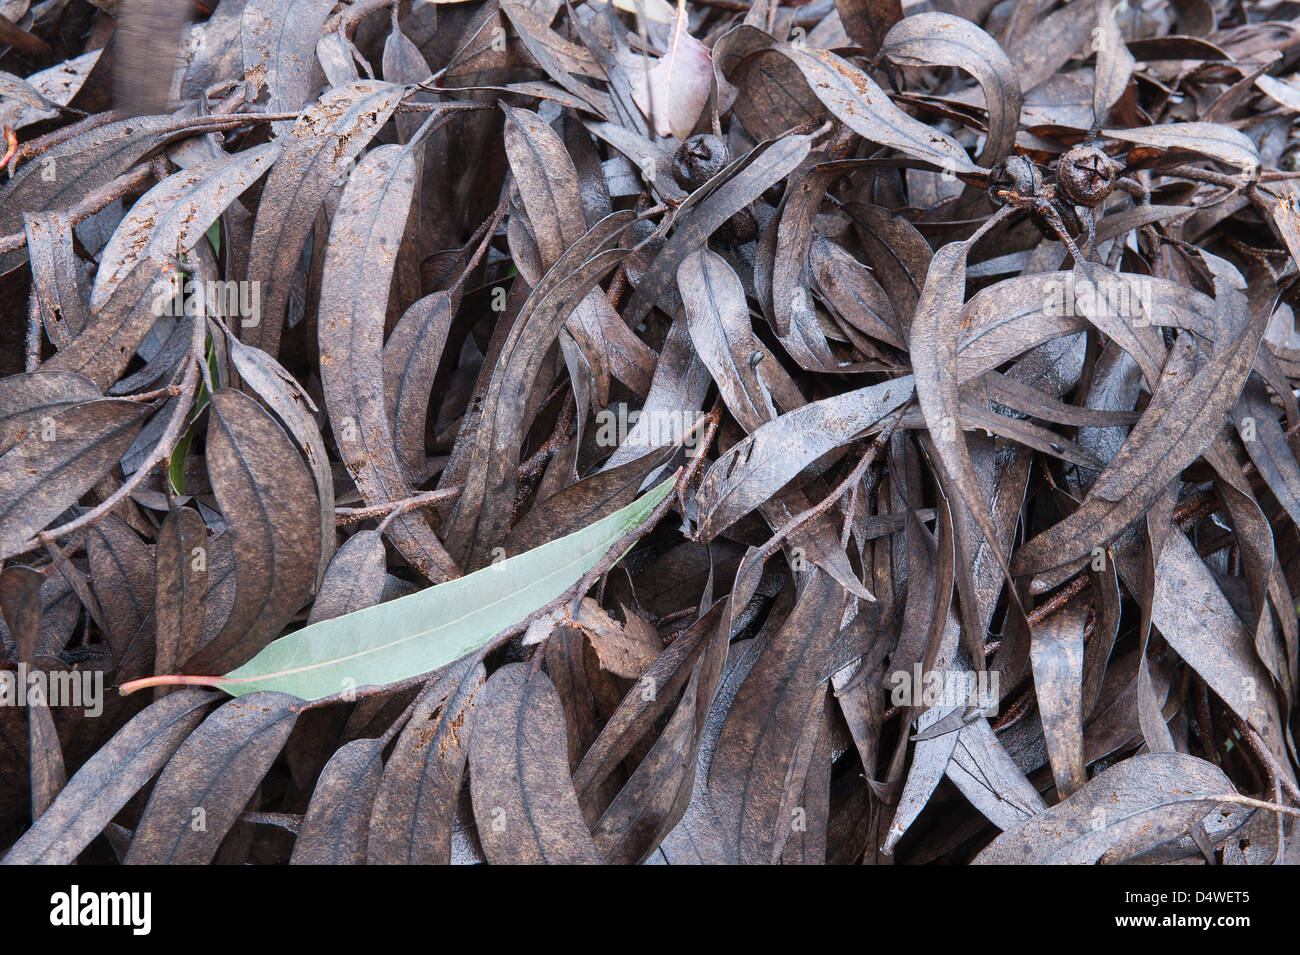 Blue Gum (Eucalyptus globulus) branches with leaves left after harvest Foia Algarve Portugal Iberian Peninsula Europe - Stock Image